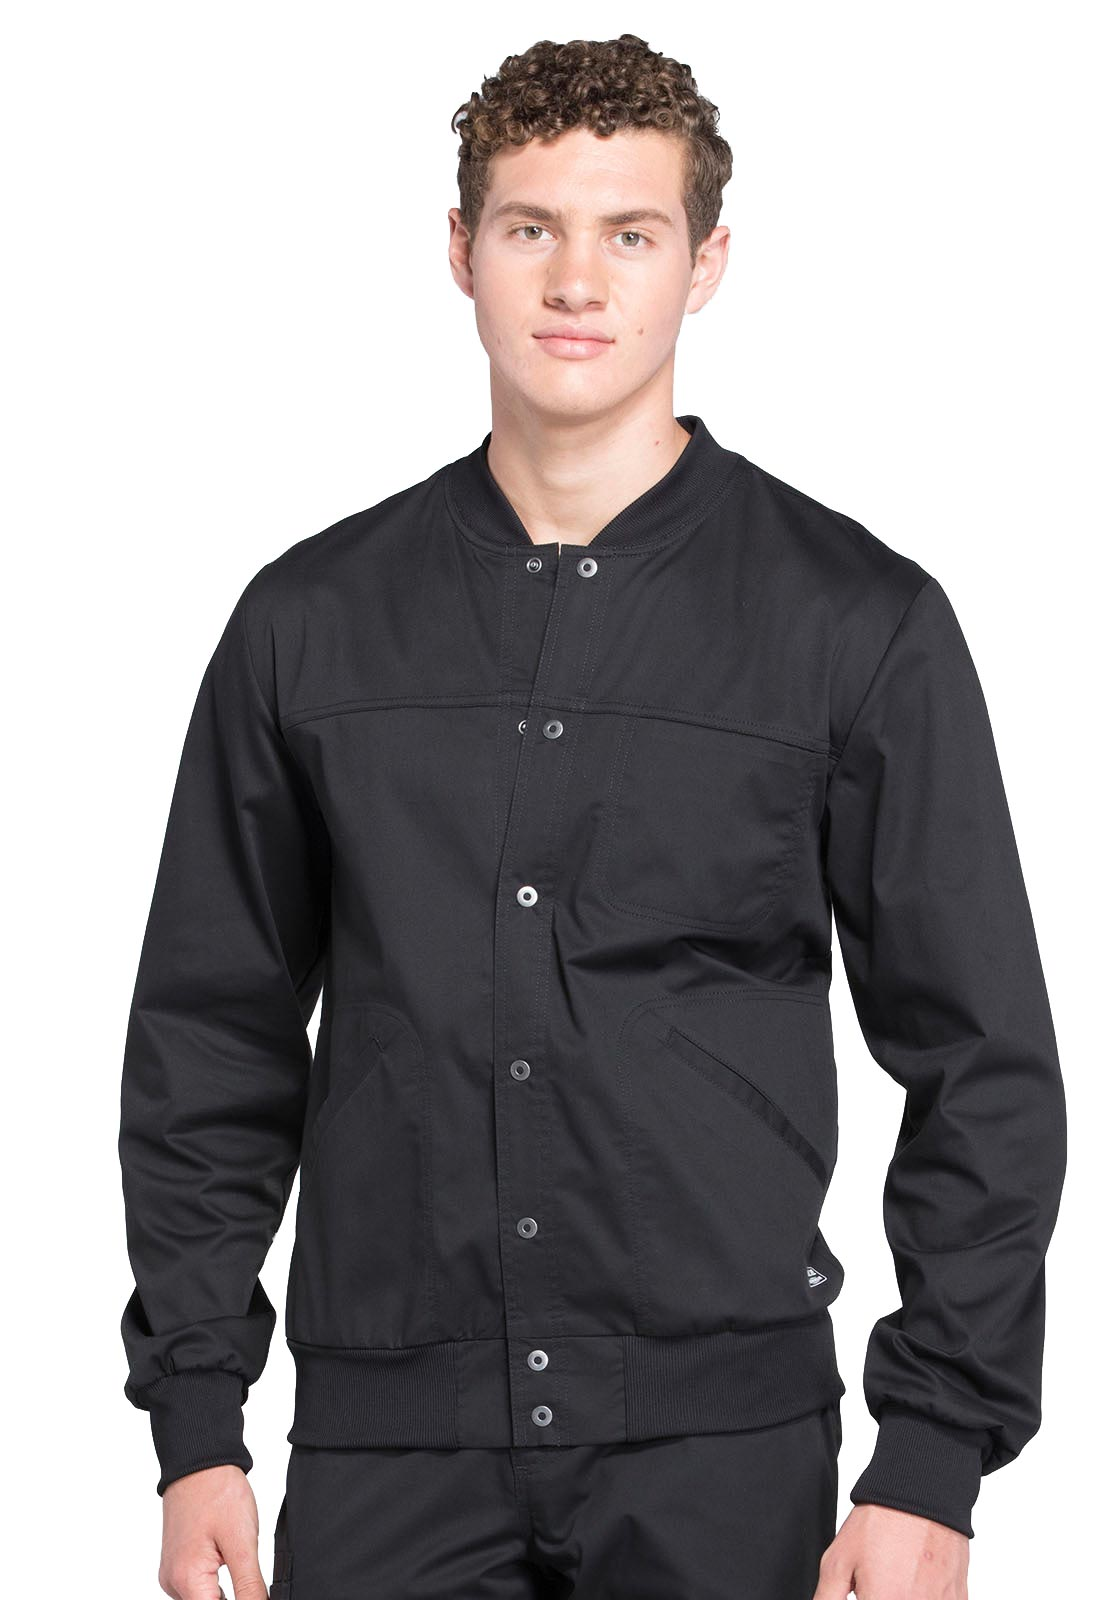 1d71b6f65b8 Scrub Jackets - Mens Scrubs - Metro Uniforms - Nursing Uniforms, Wink Scrubs,  Dickies Scrubs,.